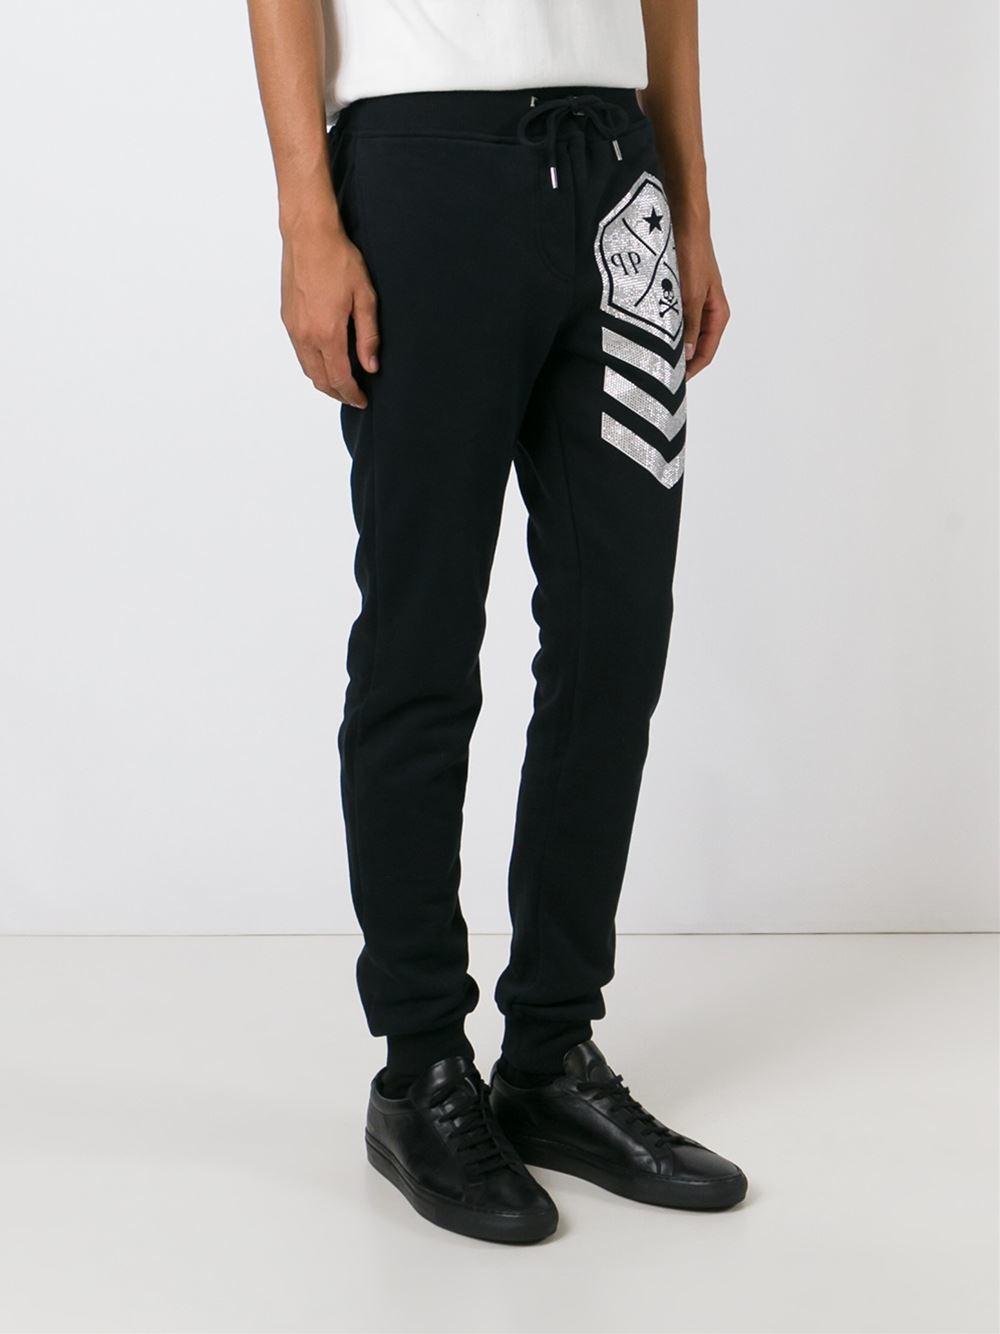 Lyst philipp plein london track pant in black for men jpg 1000x1334 London  pants c9ff84b10